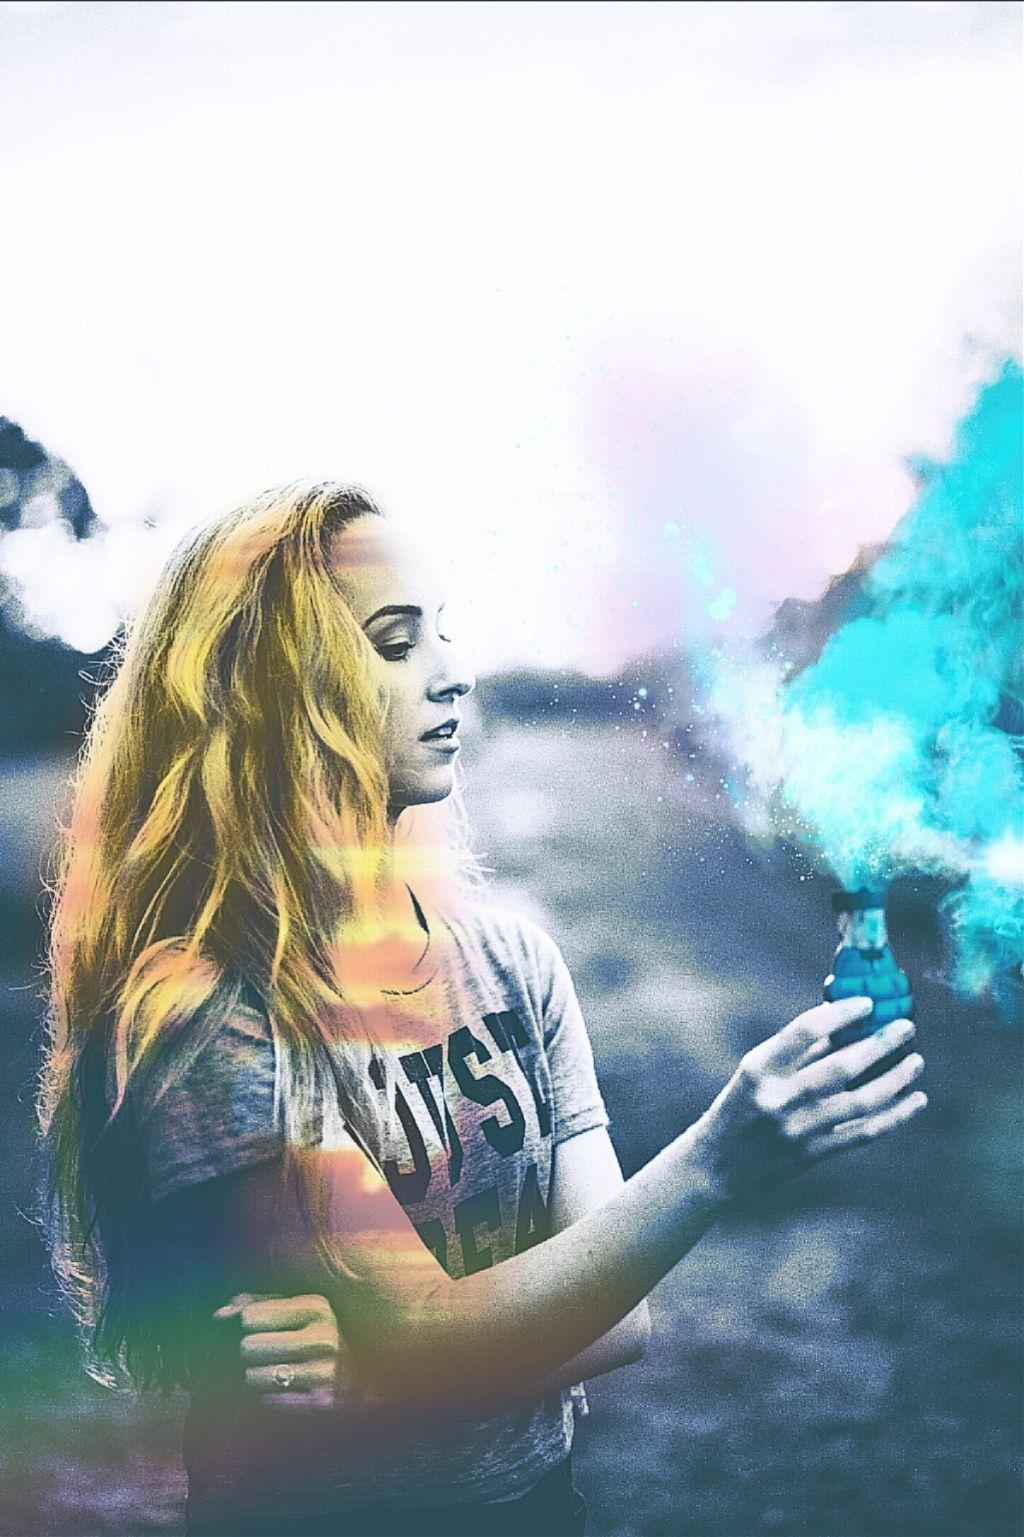 Tumblr Doubleexposure Girl Edit Rainbow Smoke Sunset